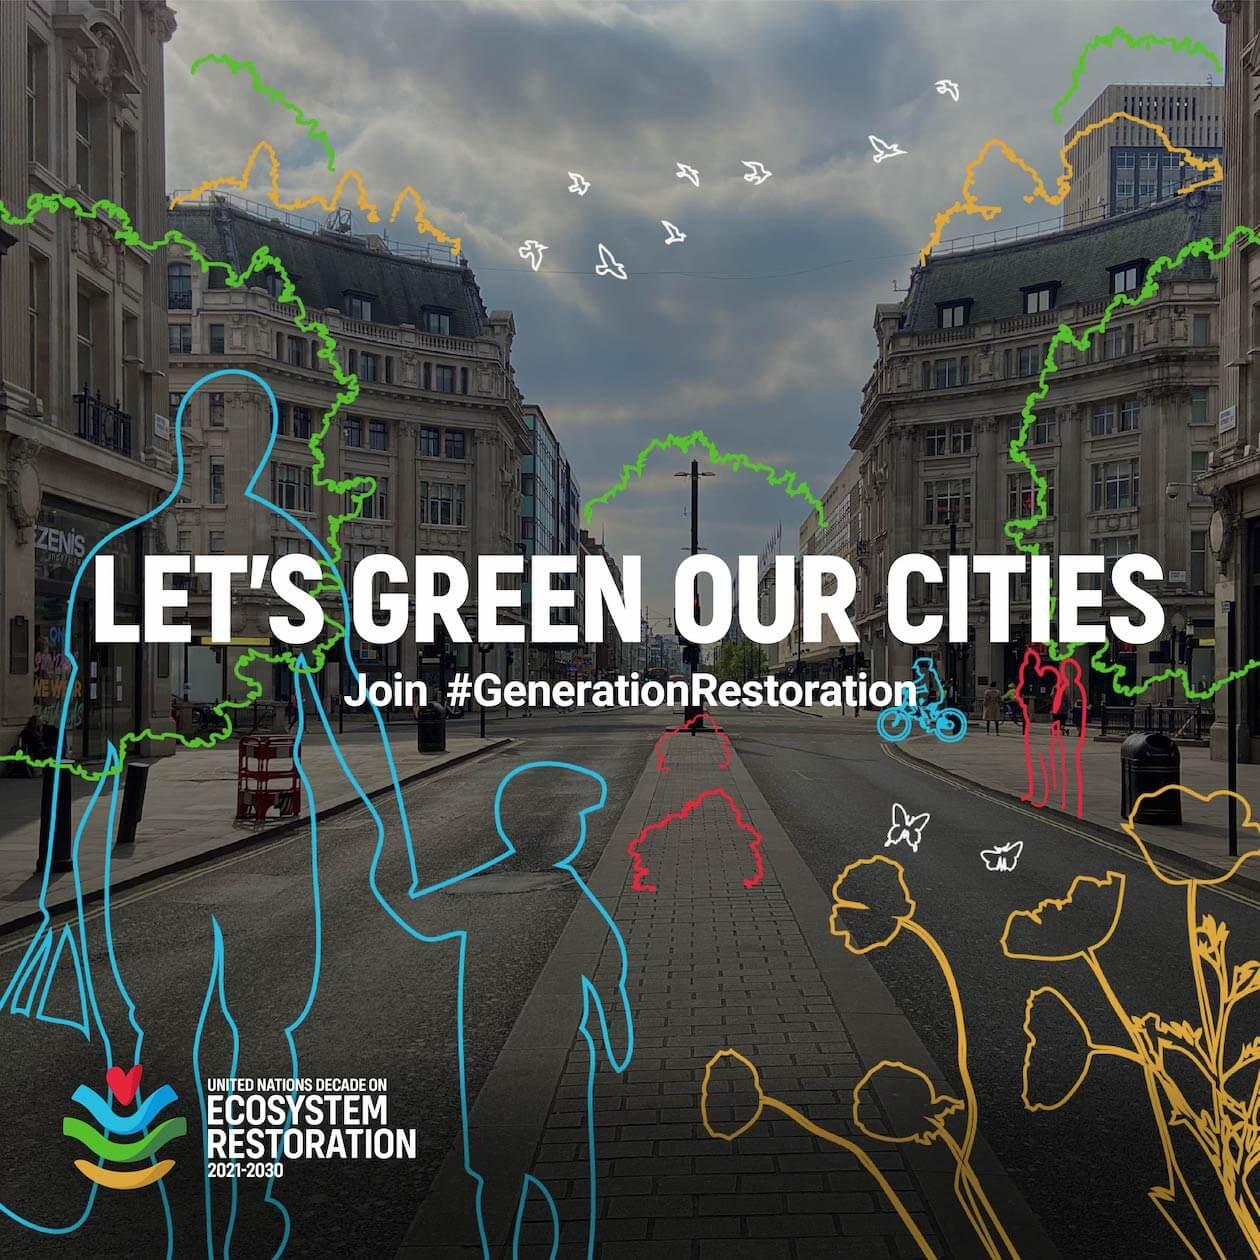 UN Decade of Ecosystem Restoration Visual